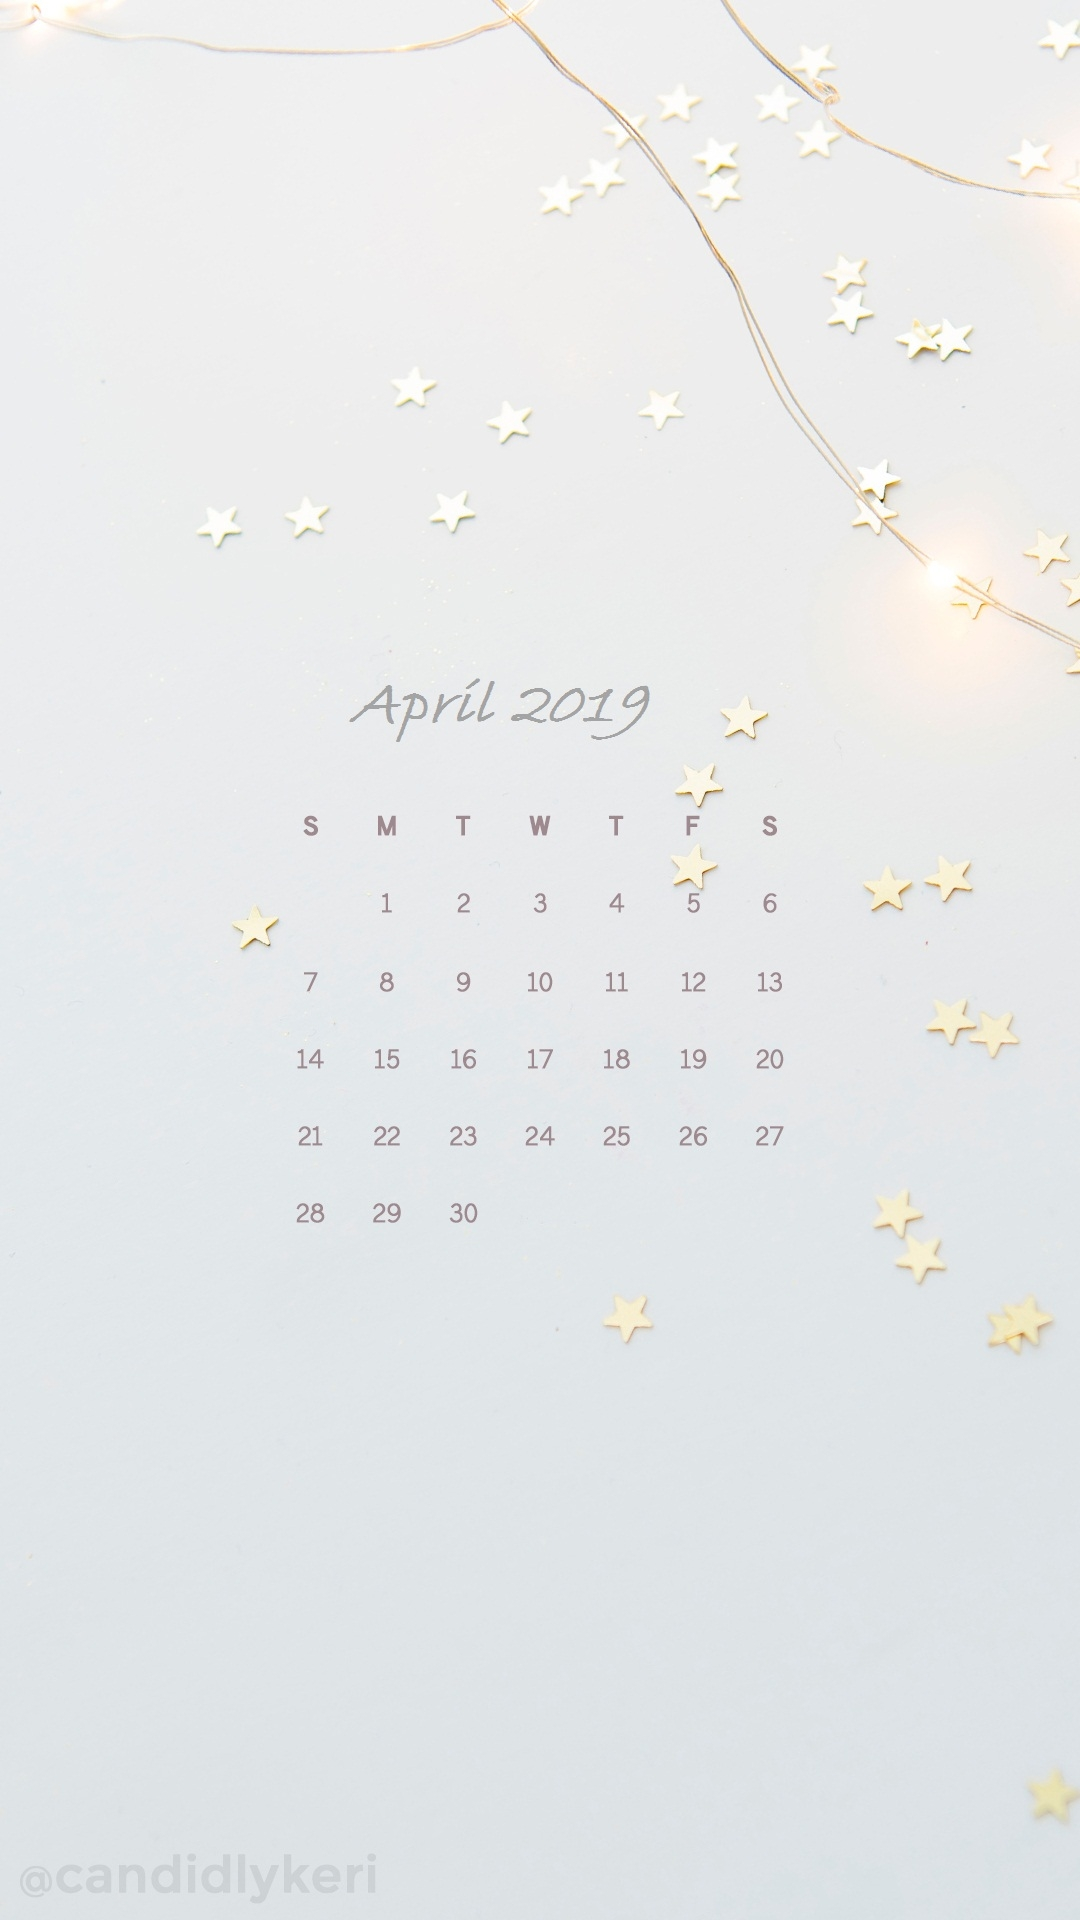 April Iphone Calendar Wallpaper